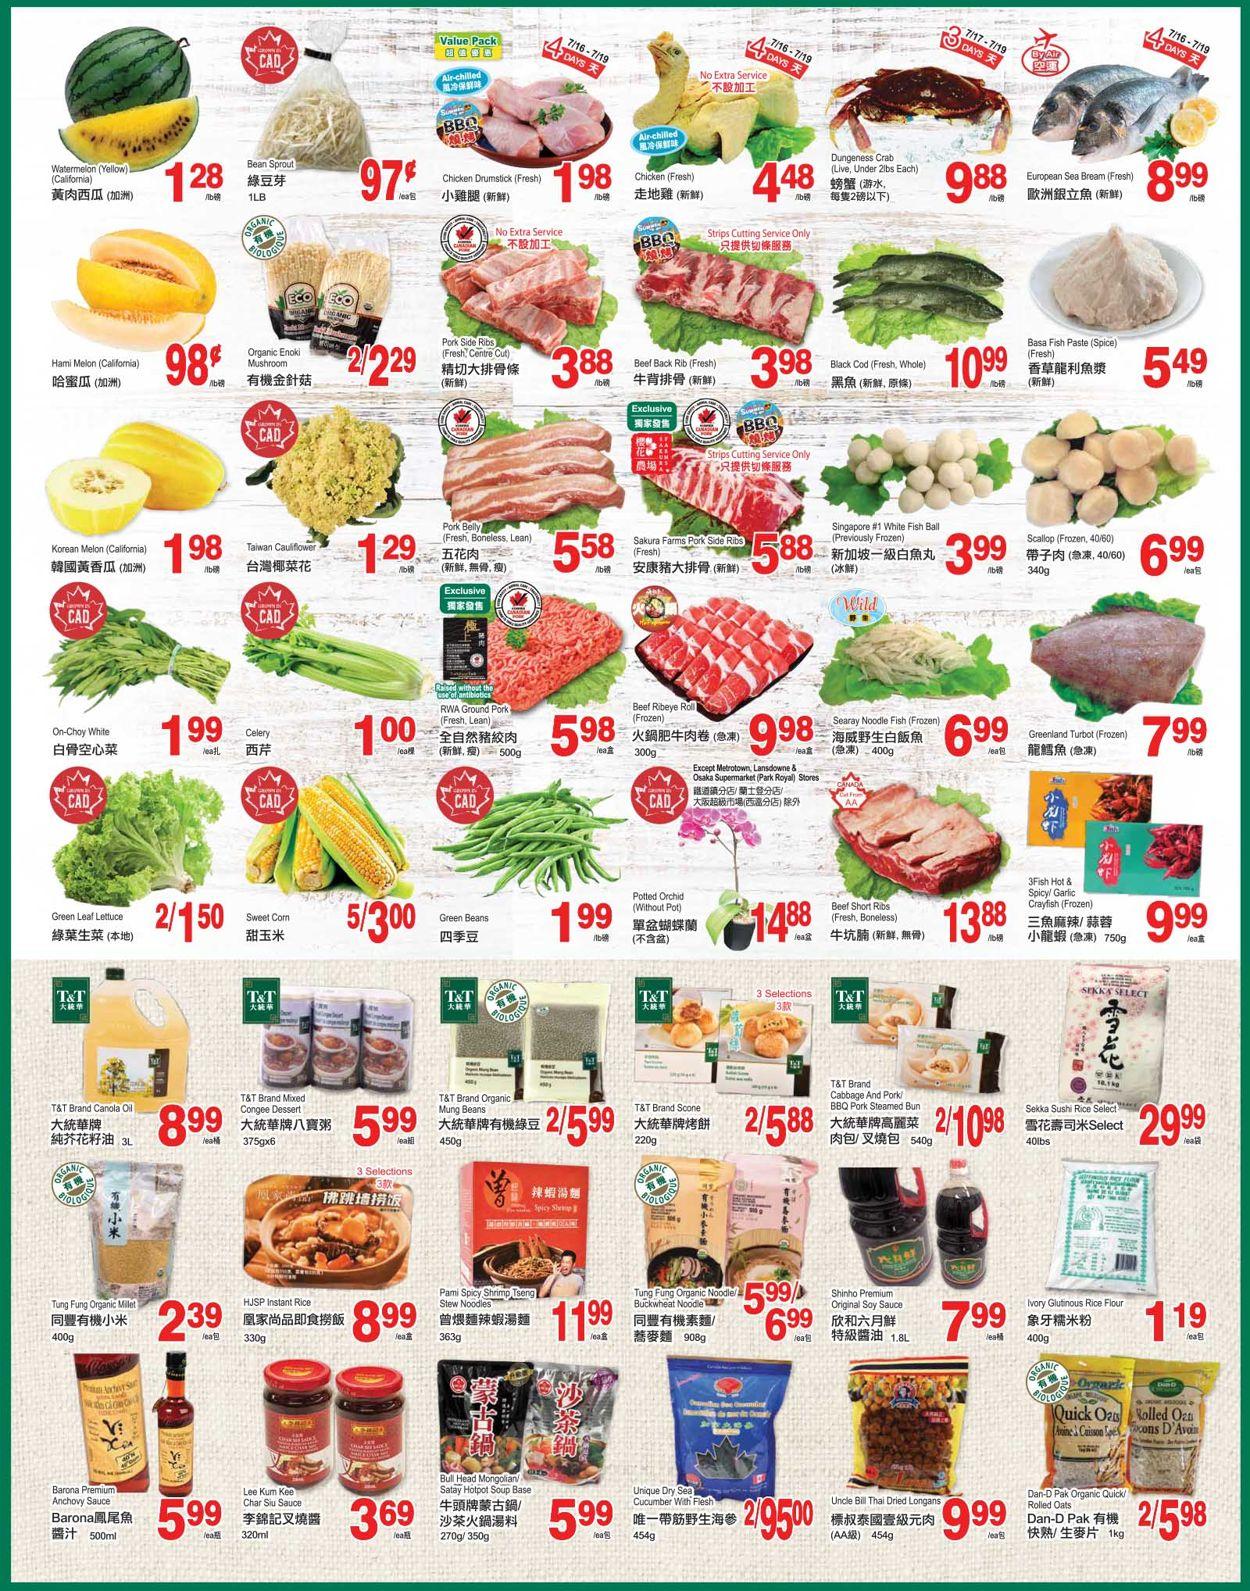 T&T Supermarket - British Columbia Flyer - 07/16-07/22/2021 (Page 2)